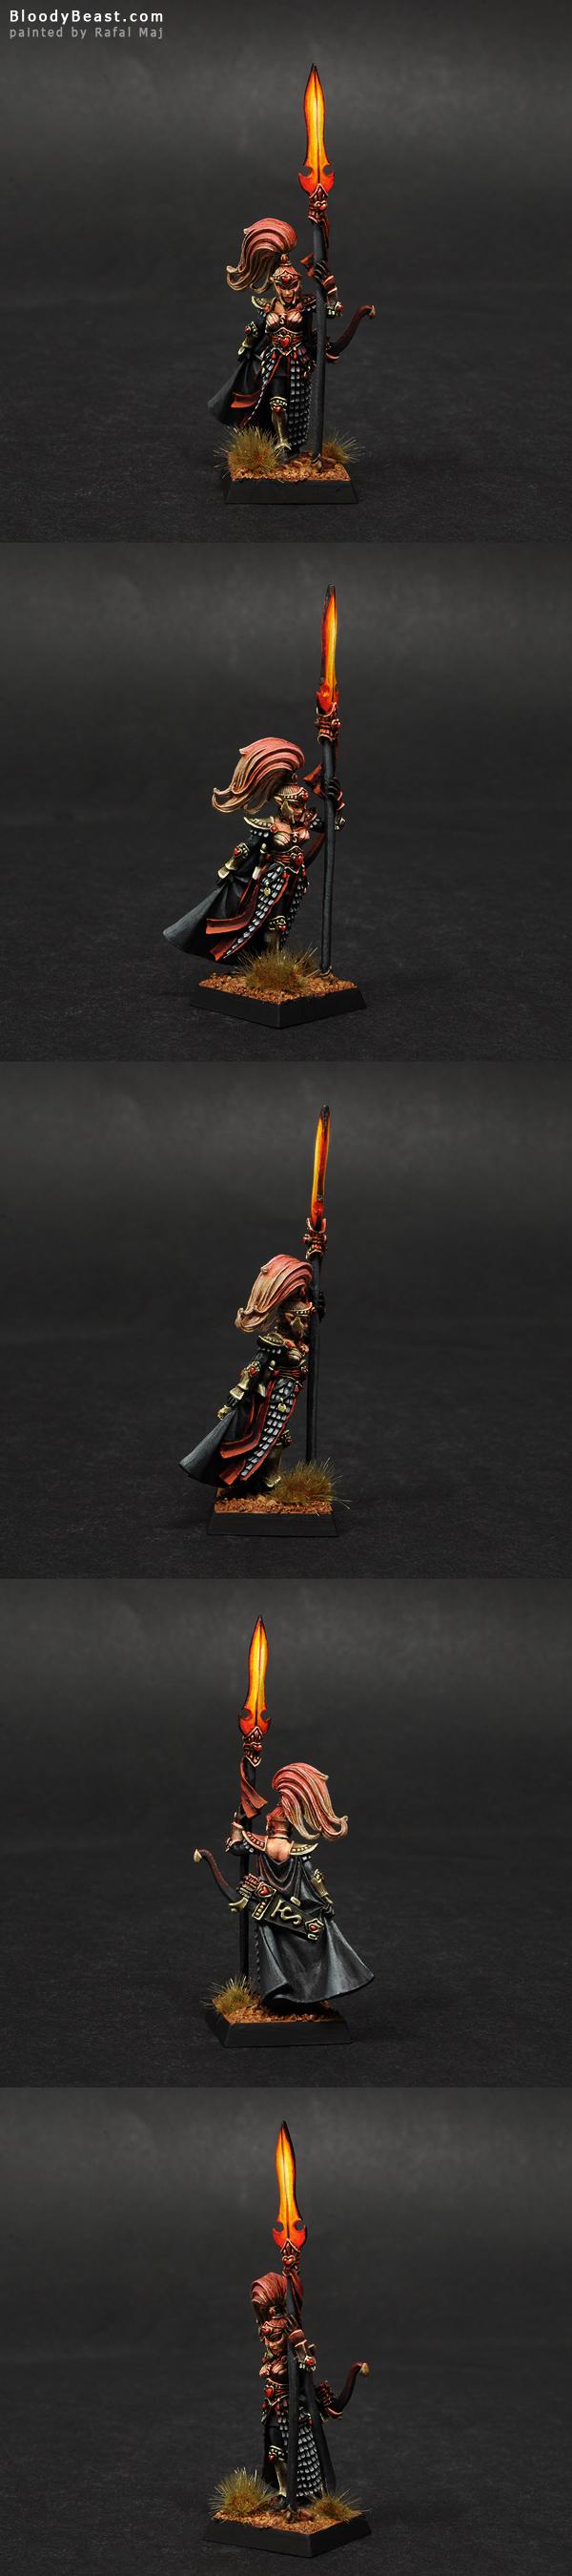 High Elf Handmaiden Of The Everqueen painted by Rafal Maj (BloodyBeast.com)